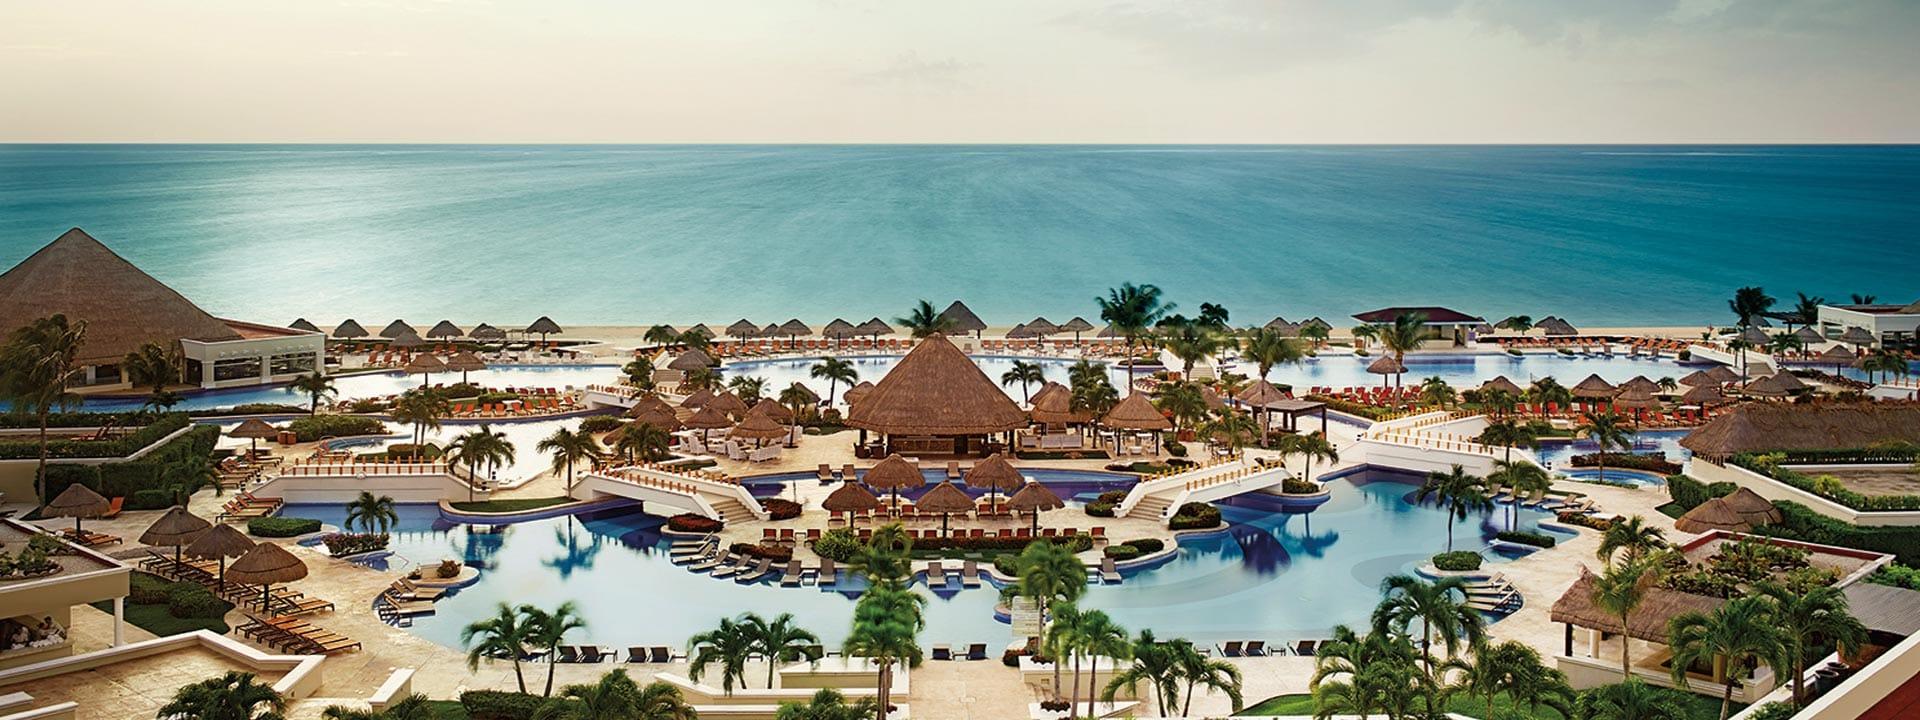 Moon Palace Golf & Spa Resort, Cancun